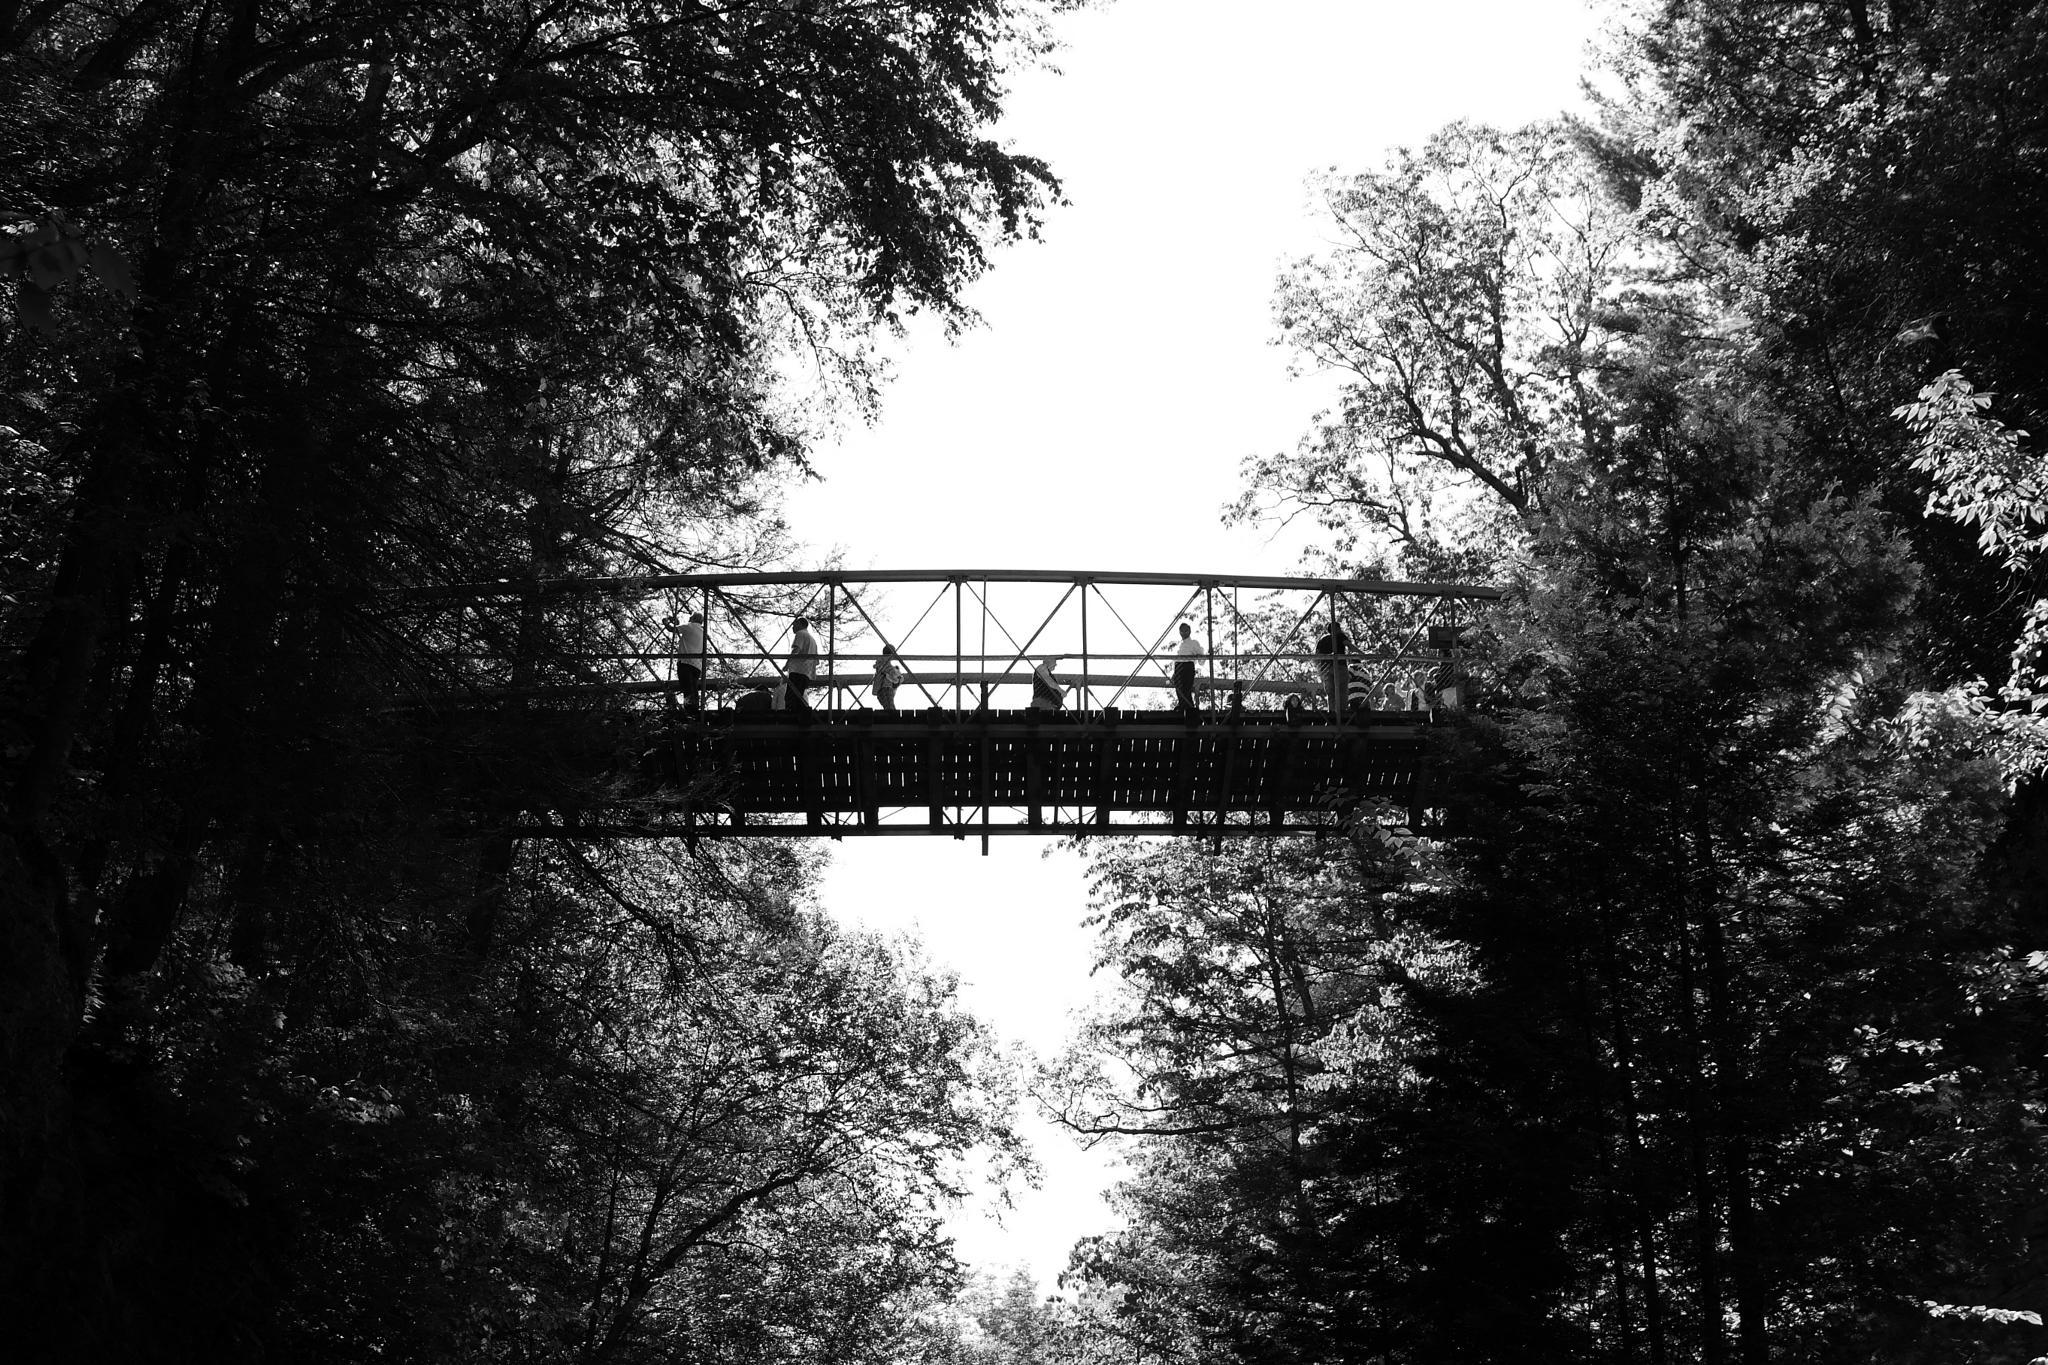 A Bridge Across The Gorge by visbimmer79